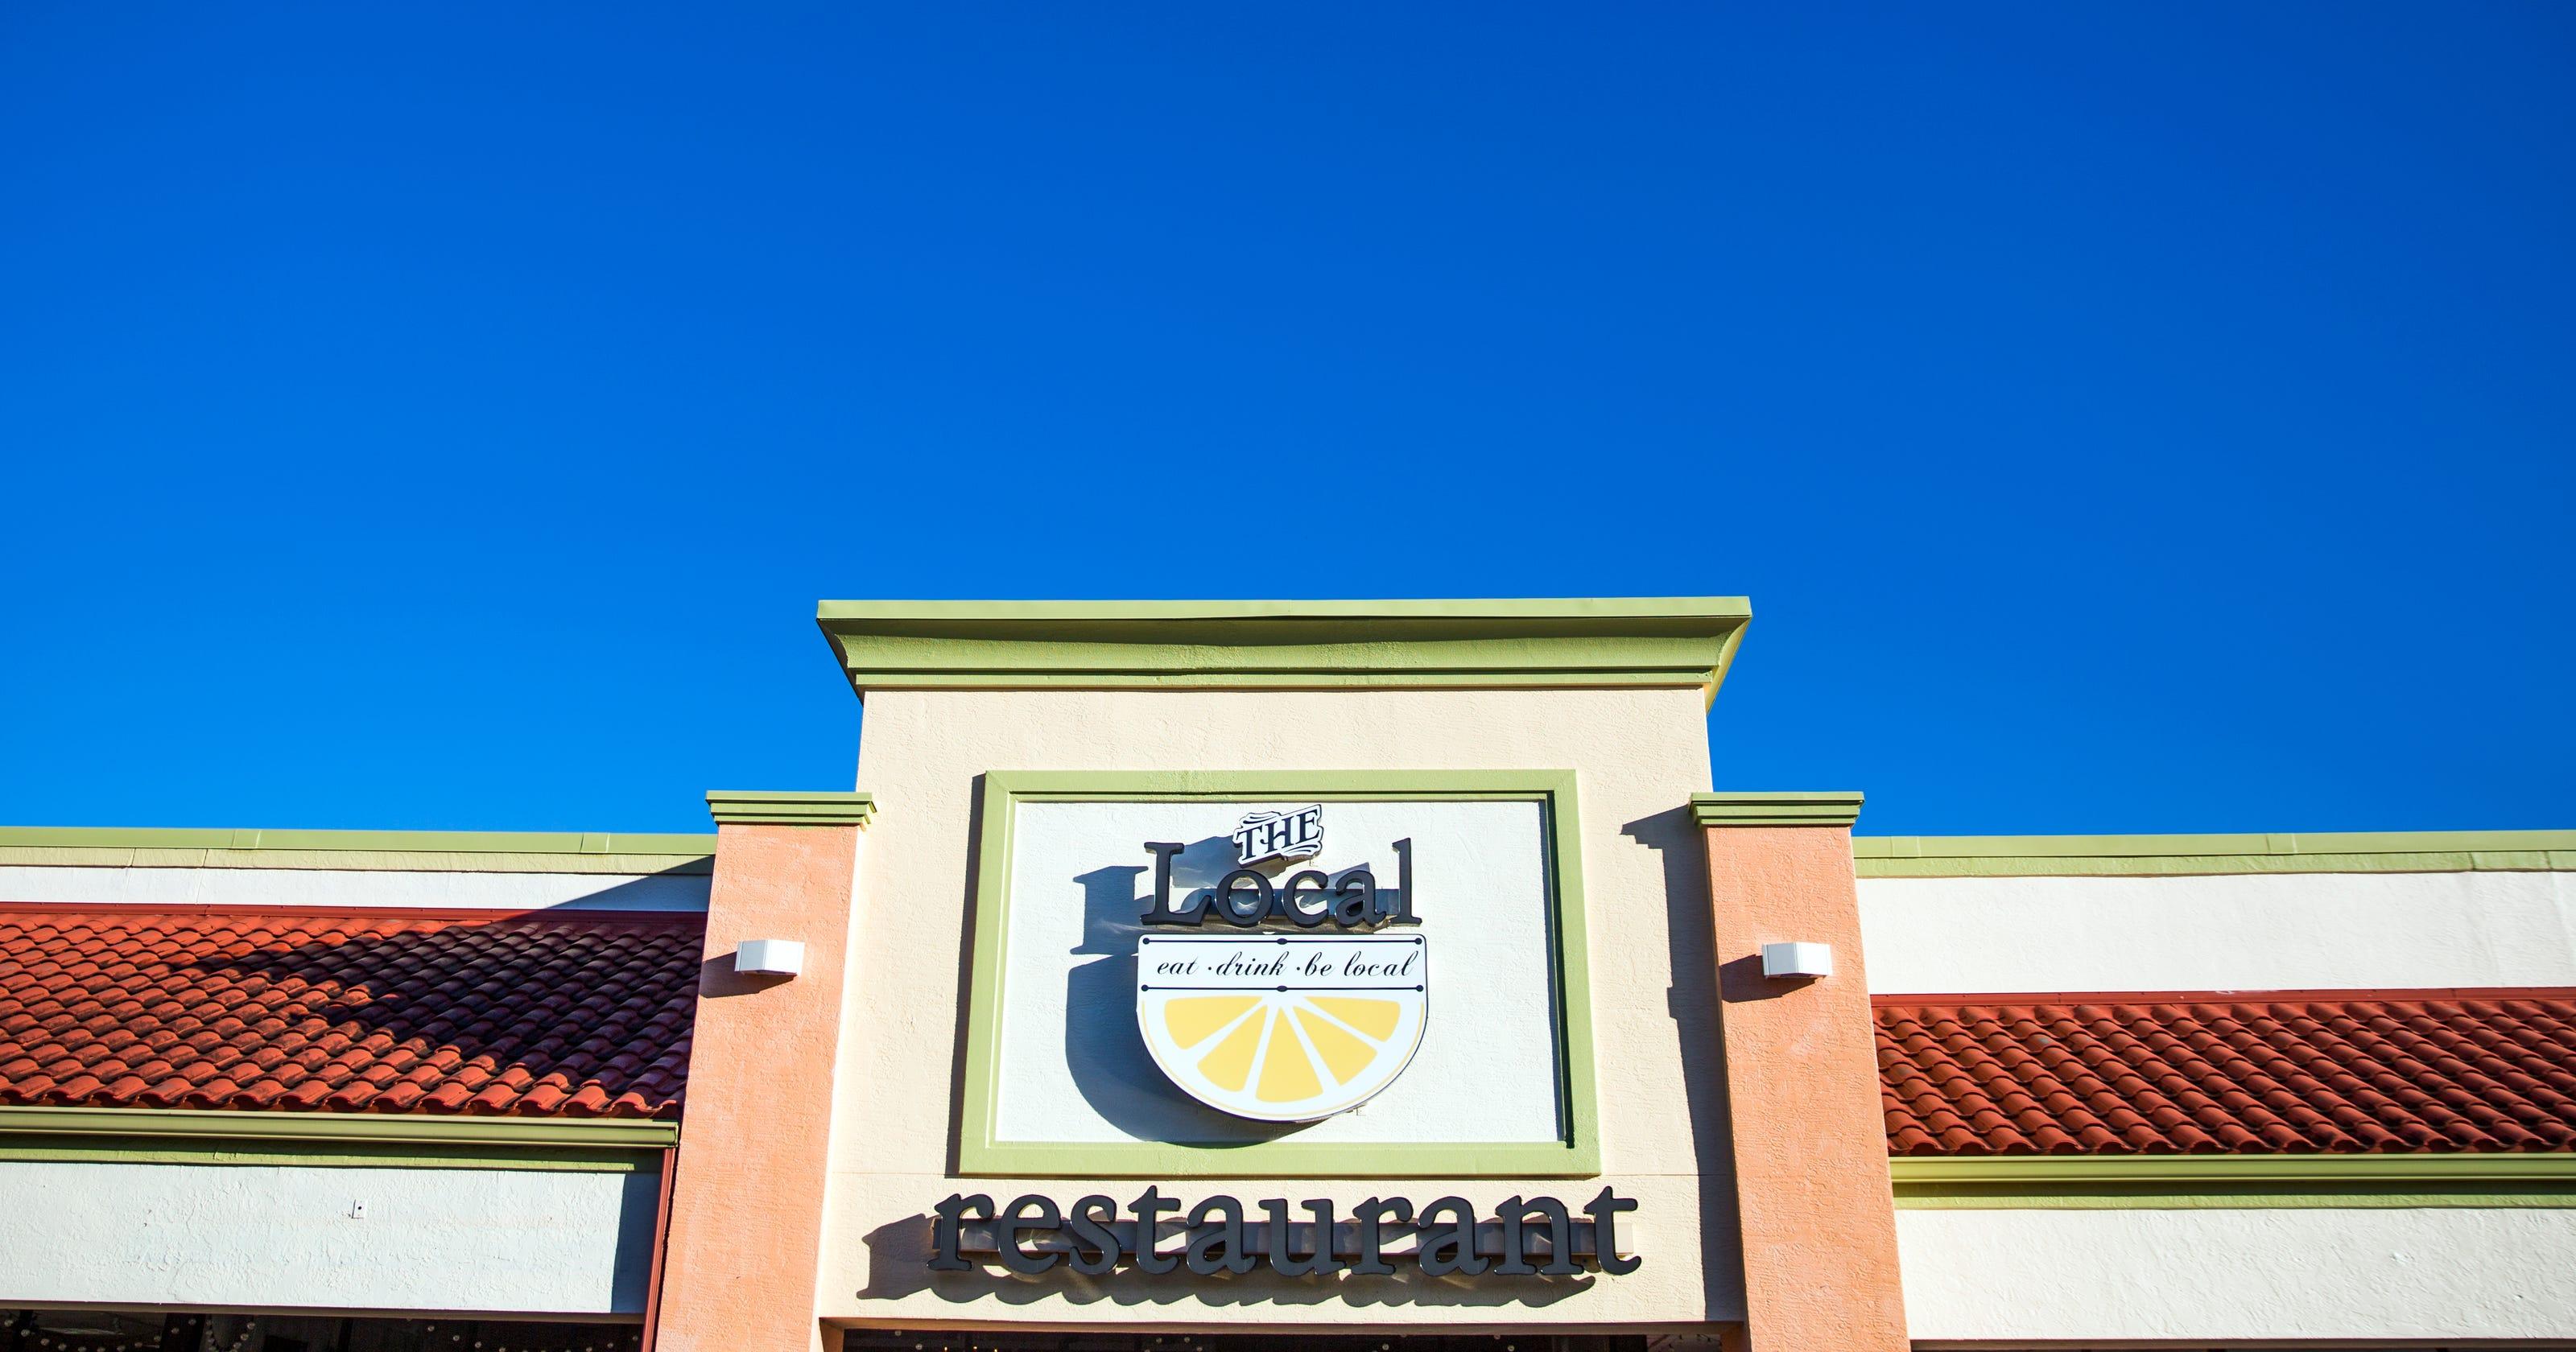 Naples restaurants: The Local celebrates 5 years — JLB review